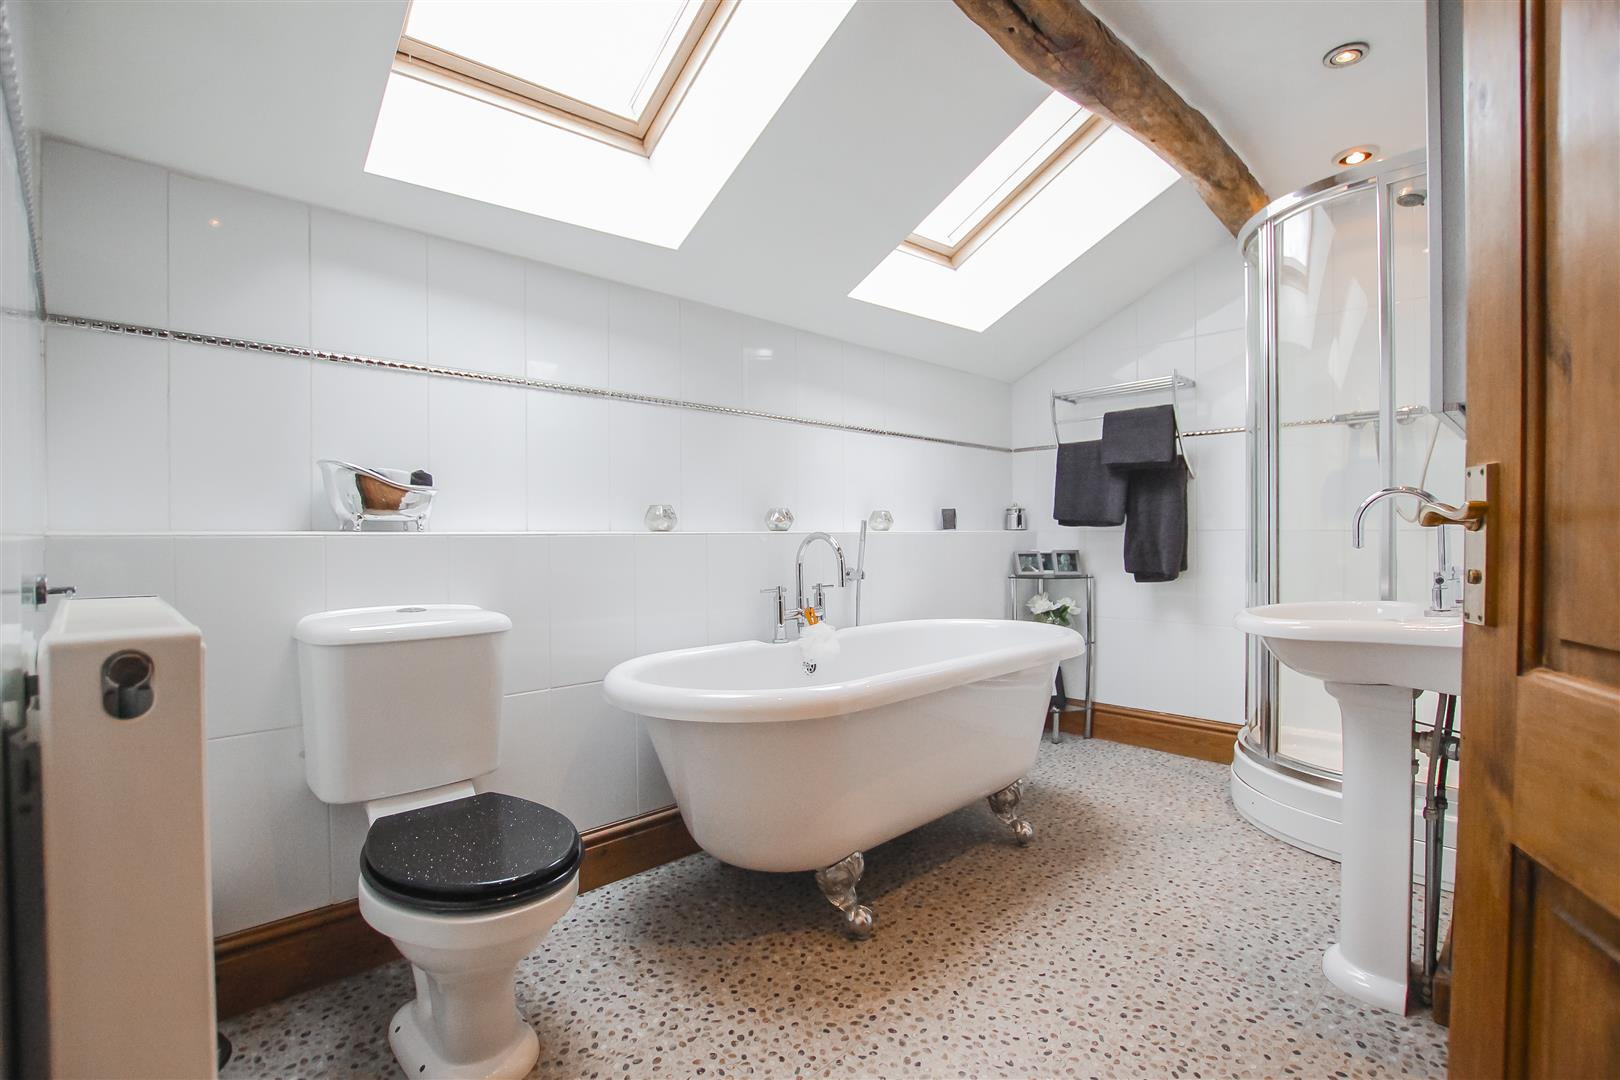 4 Bedroom Semi-detached House For Sale - Image 6